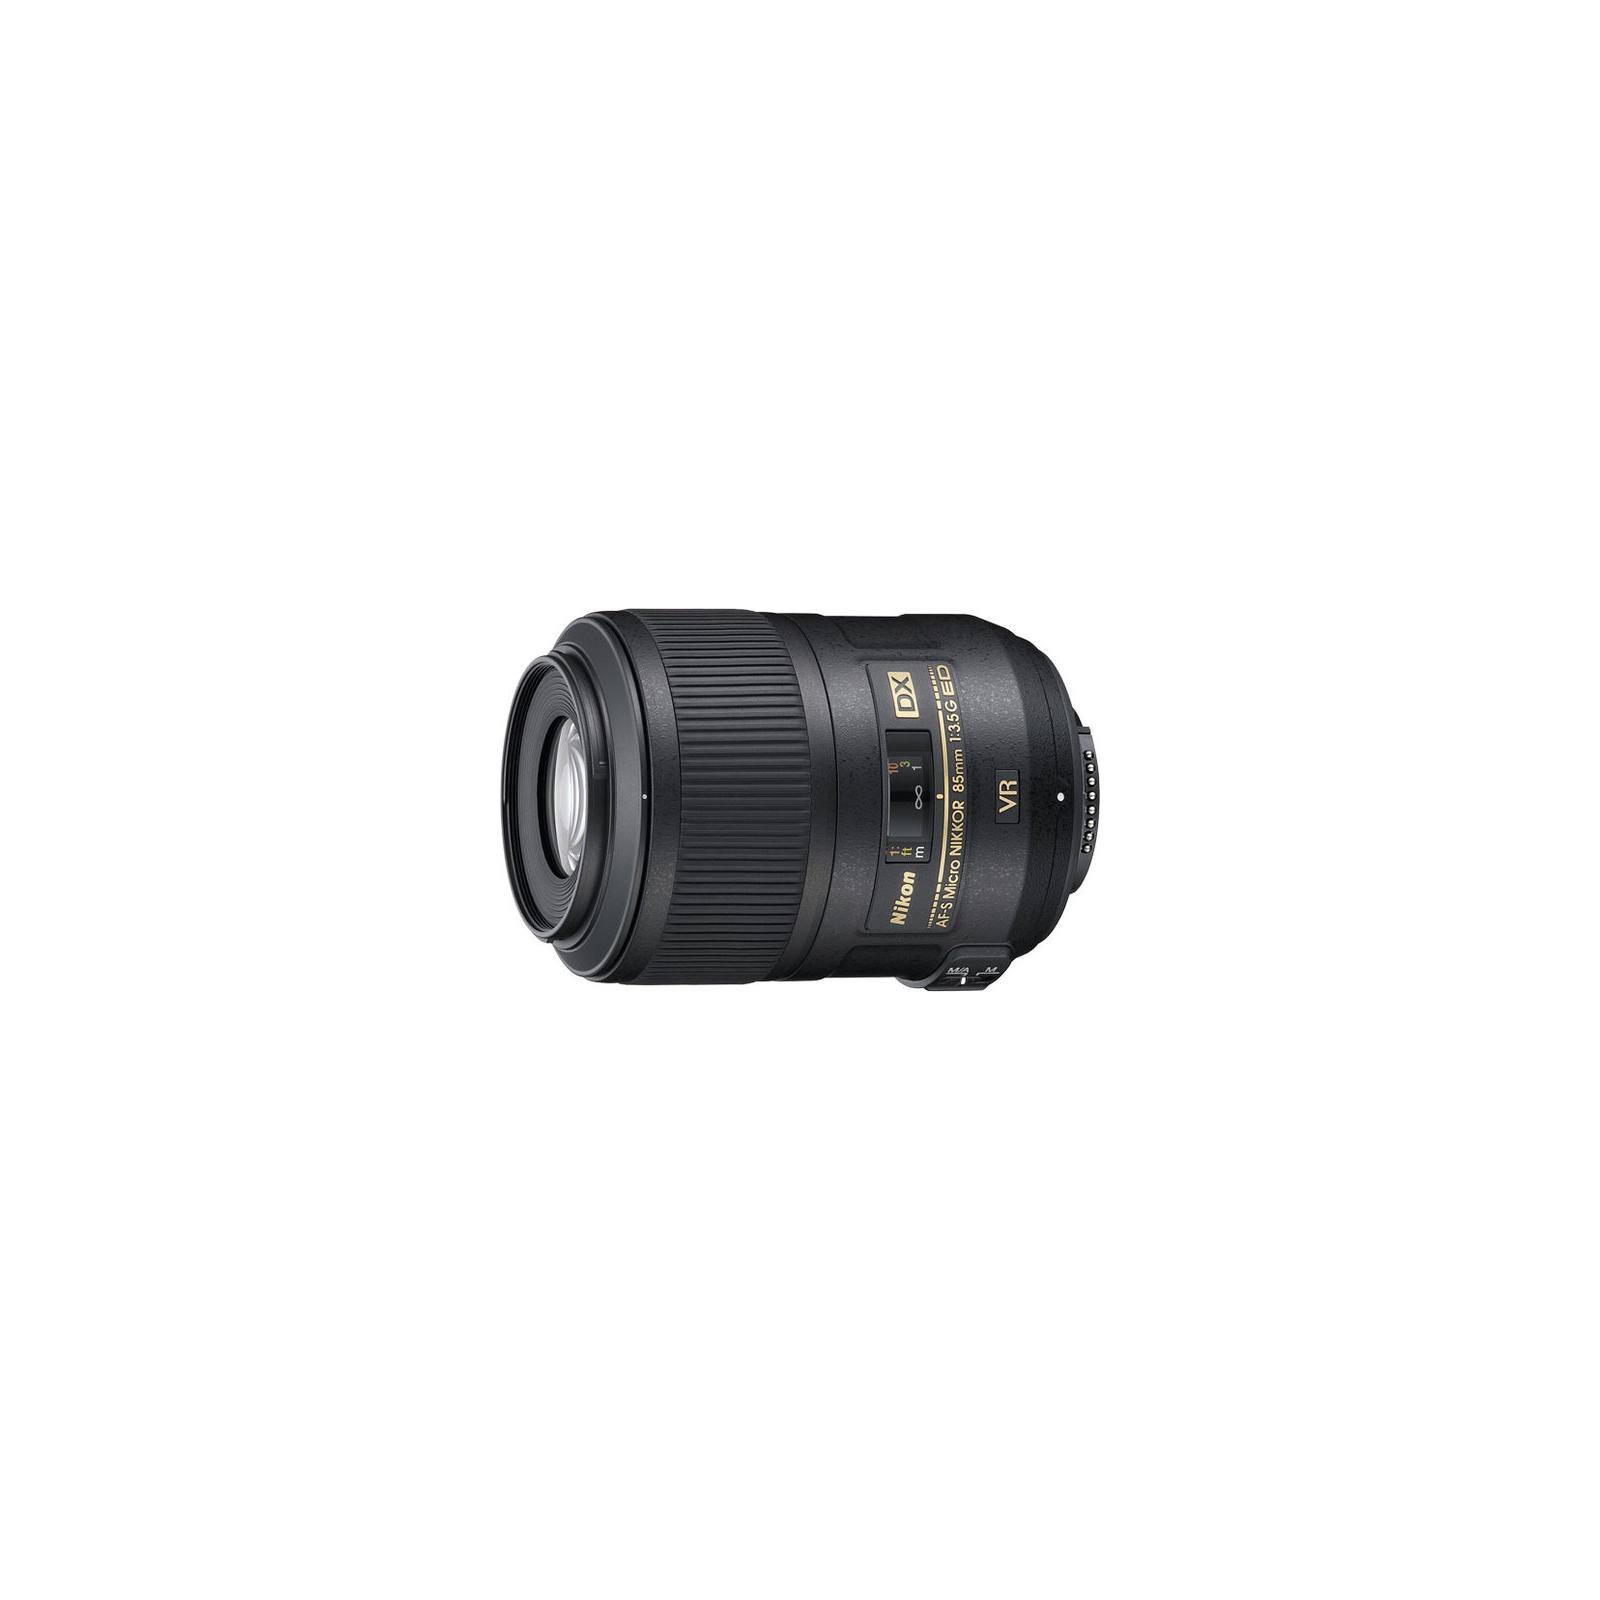 Объектив Nikon AF-S DX Micro 85mm f/3.5G ED VR (JAA637DA)